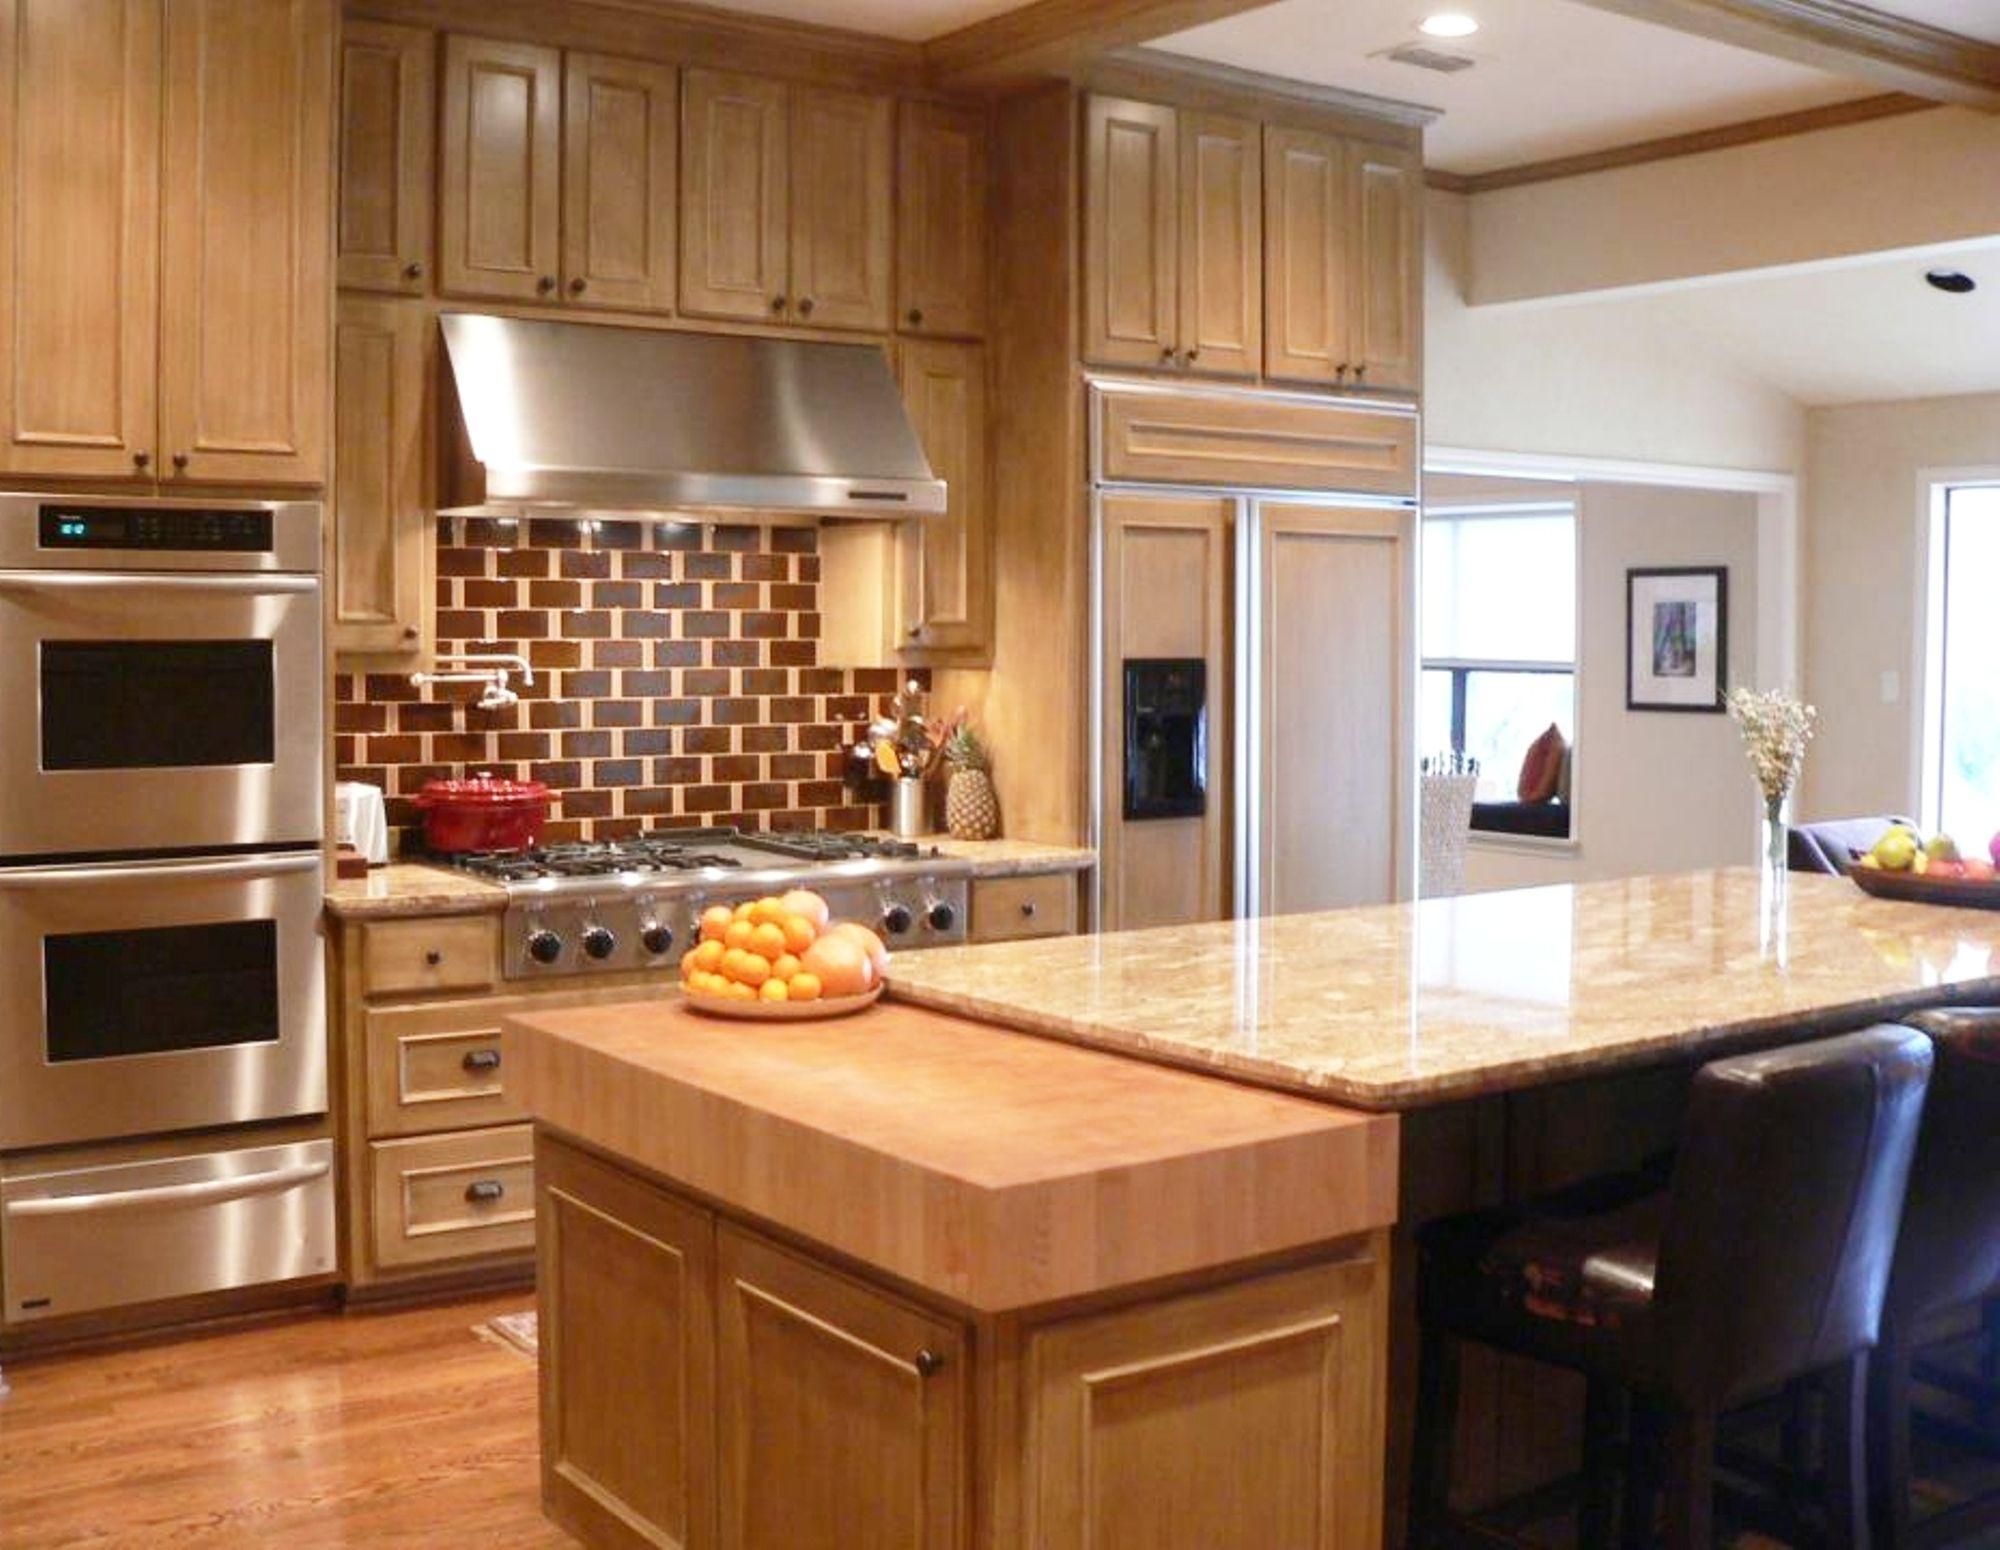 maple butcher block countertop kitchen backsplash countertops p